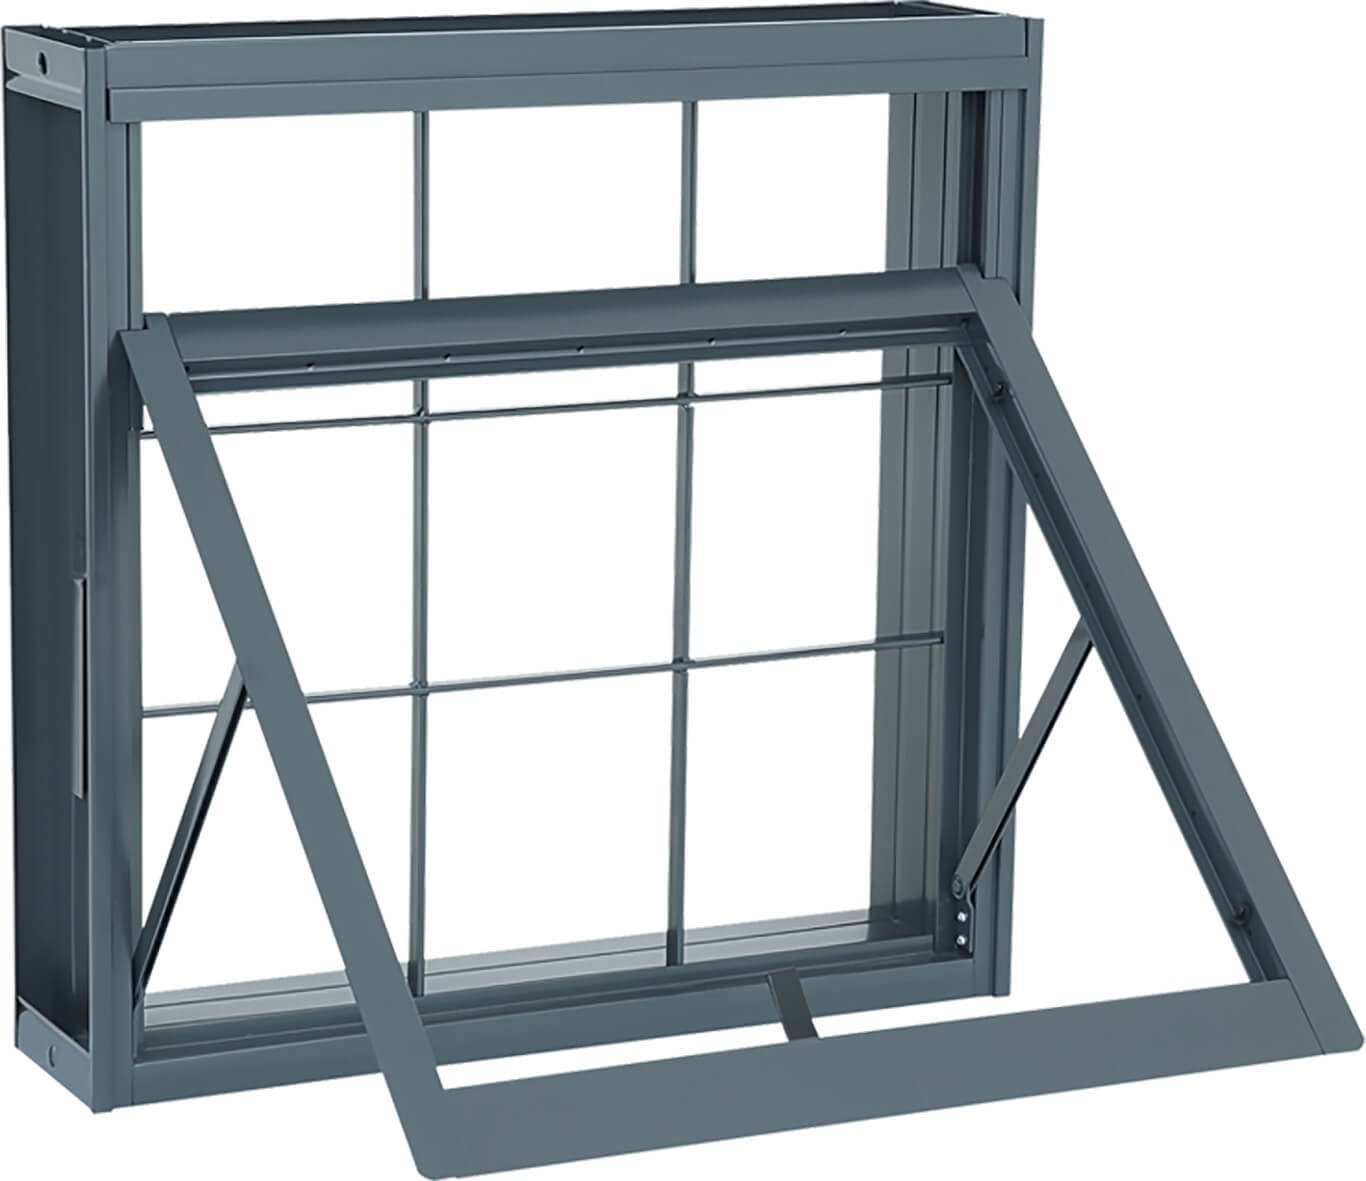 Silenfort Janela Maxim-Ar - 0.40x0.60x08 Sasazaki Ref. 64.34.100-6